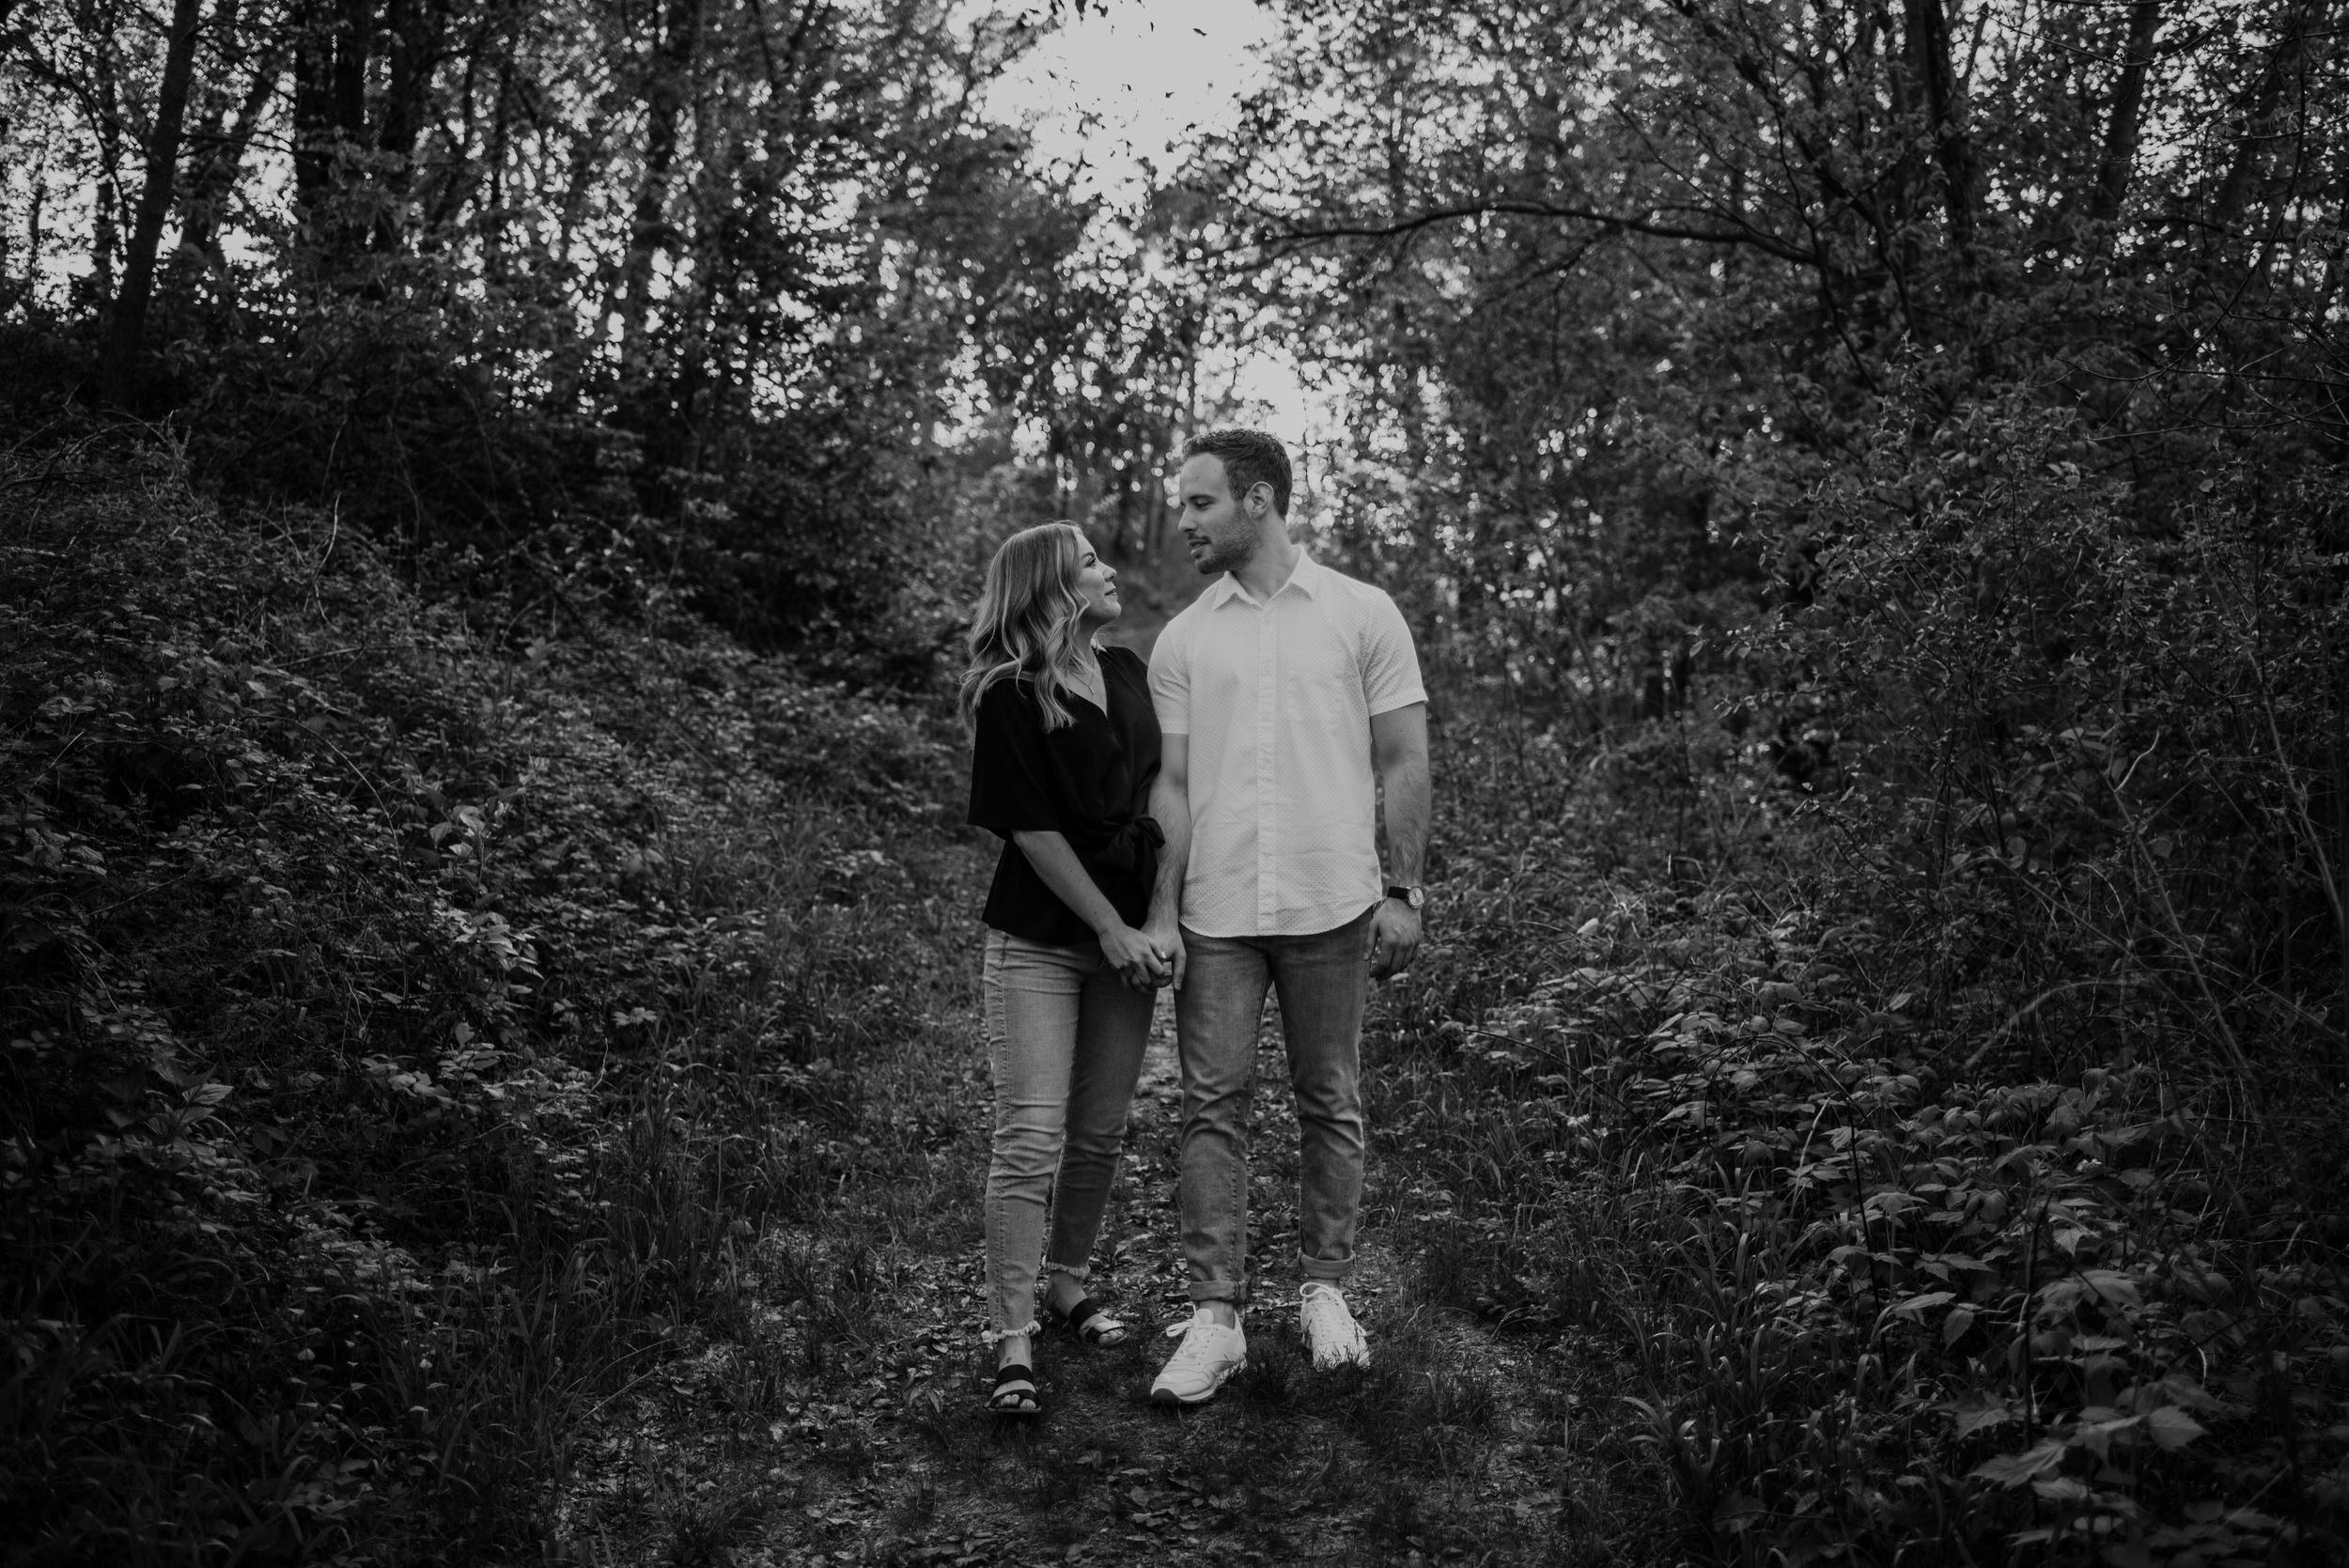 Omaha-Nebraska-Engagement-Session-Kaylie-Sirek-Photography-122.jpg